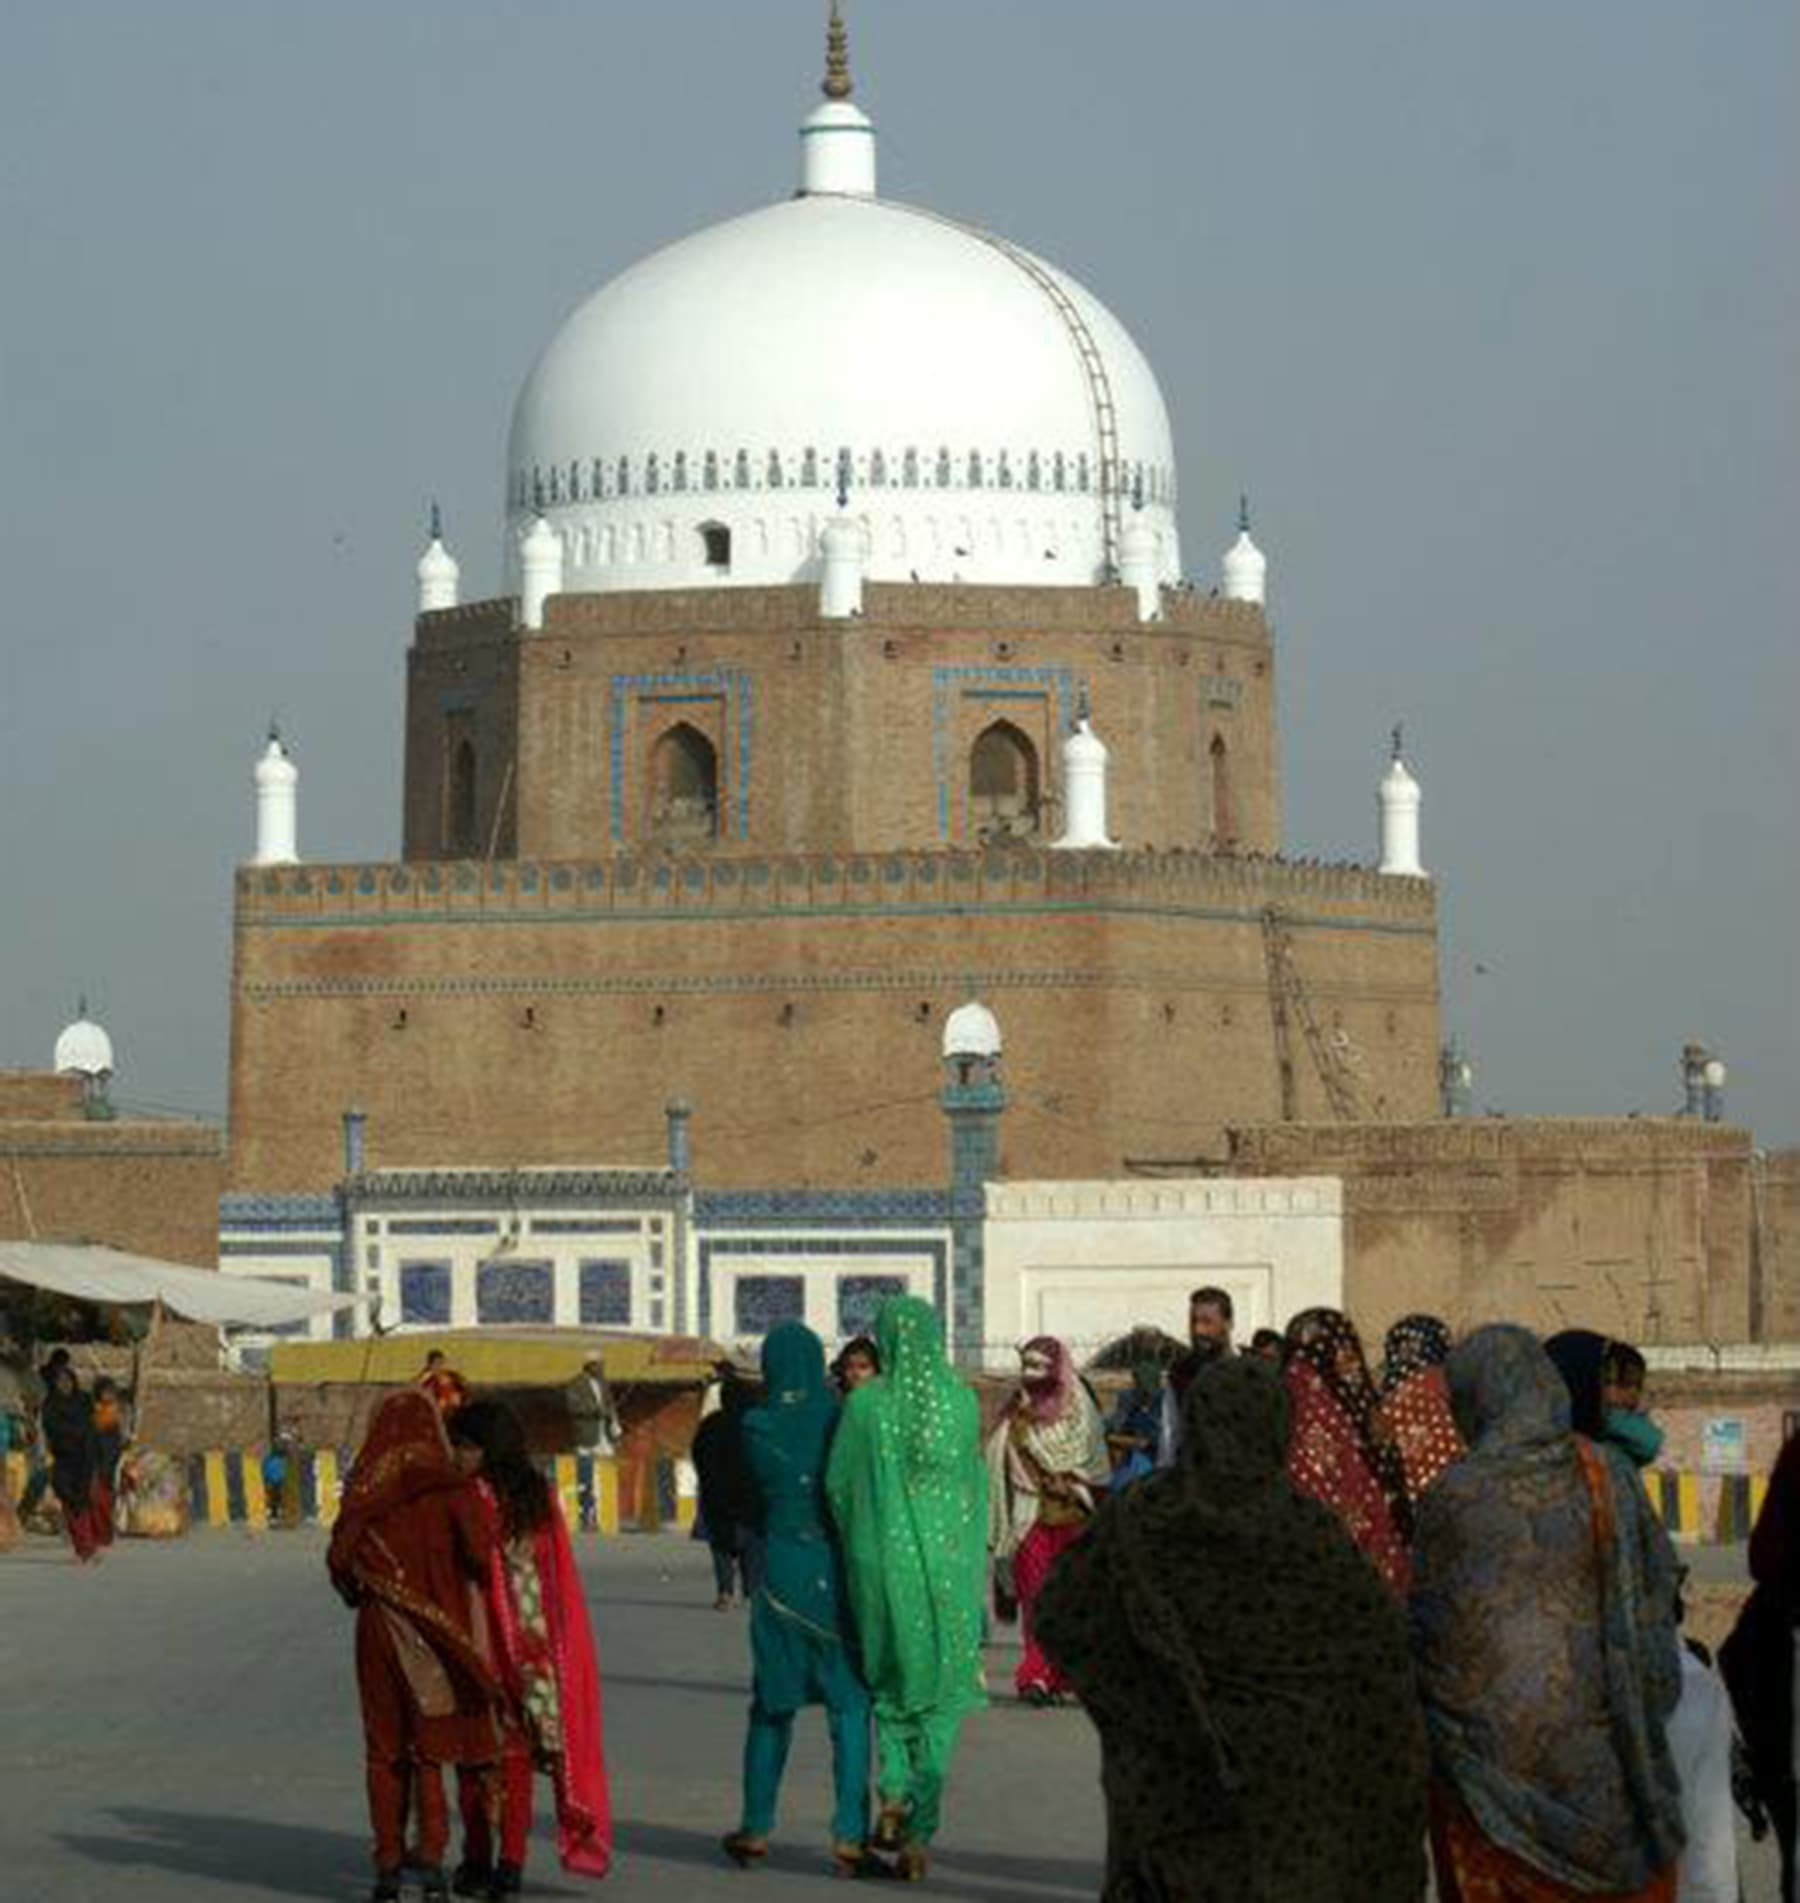 مقبرہ شیخ بہاؤ الدین زکریا ملتانی—عبیداللہ کیہر